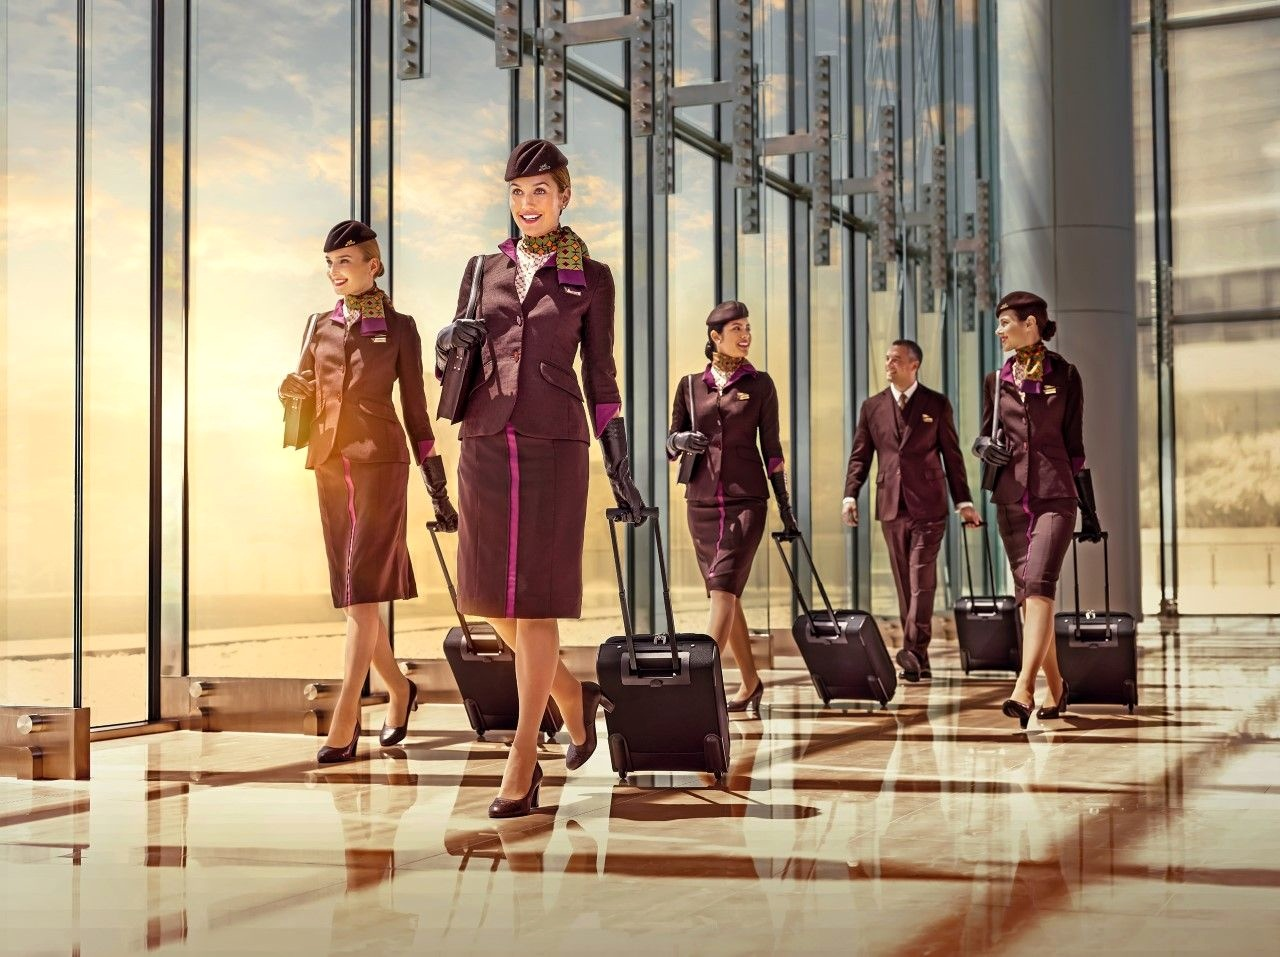 اتحاد ایرویز (Etihad Airways)، امارات متحده عربی